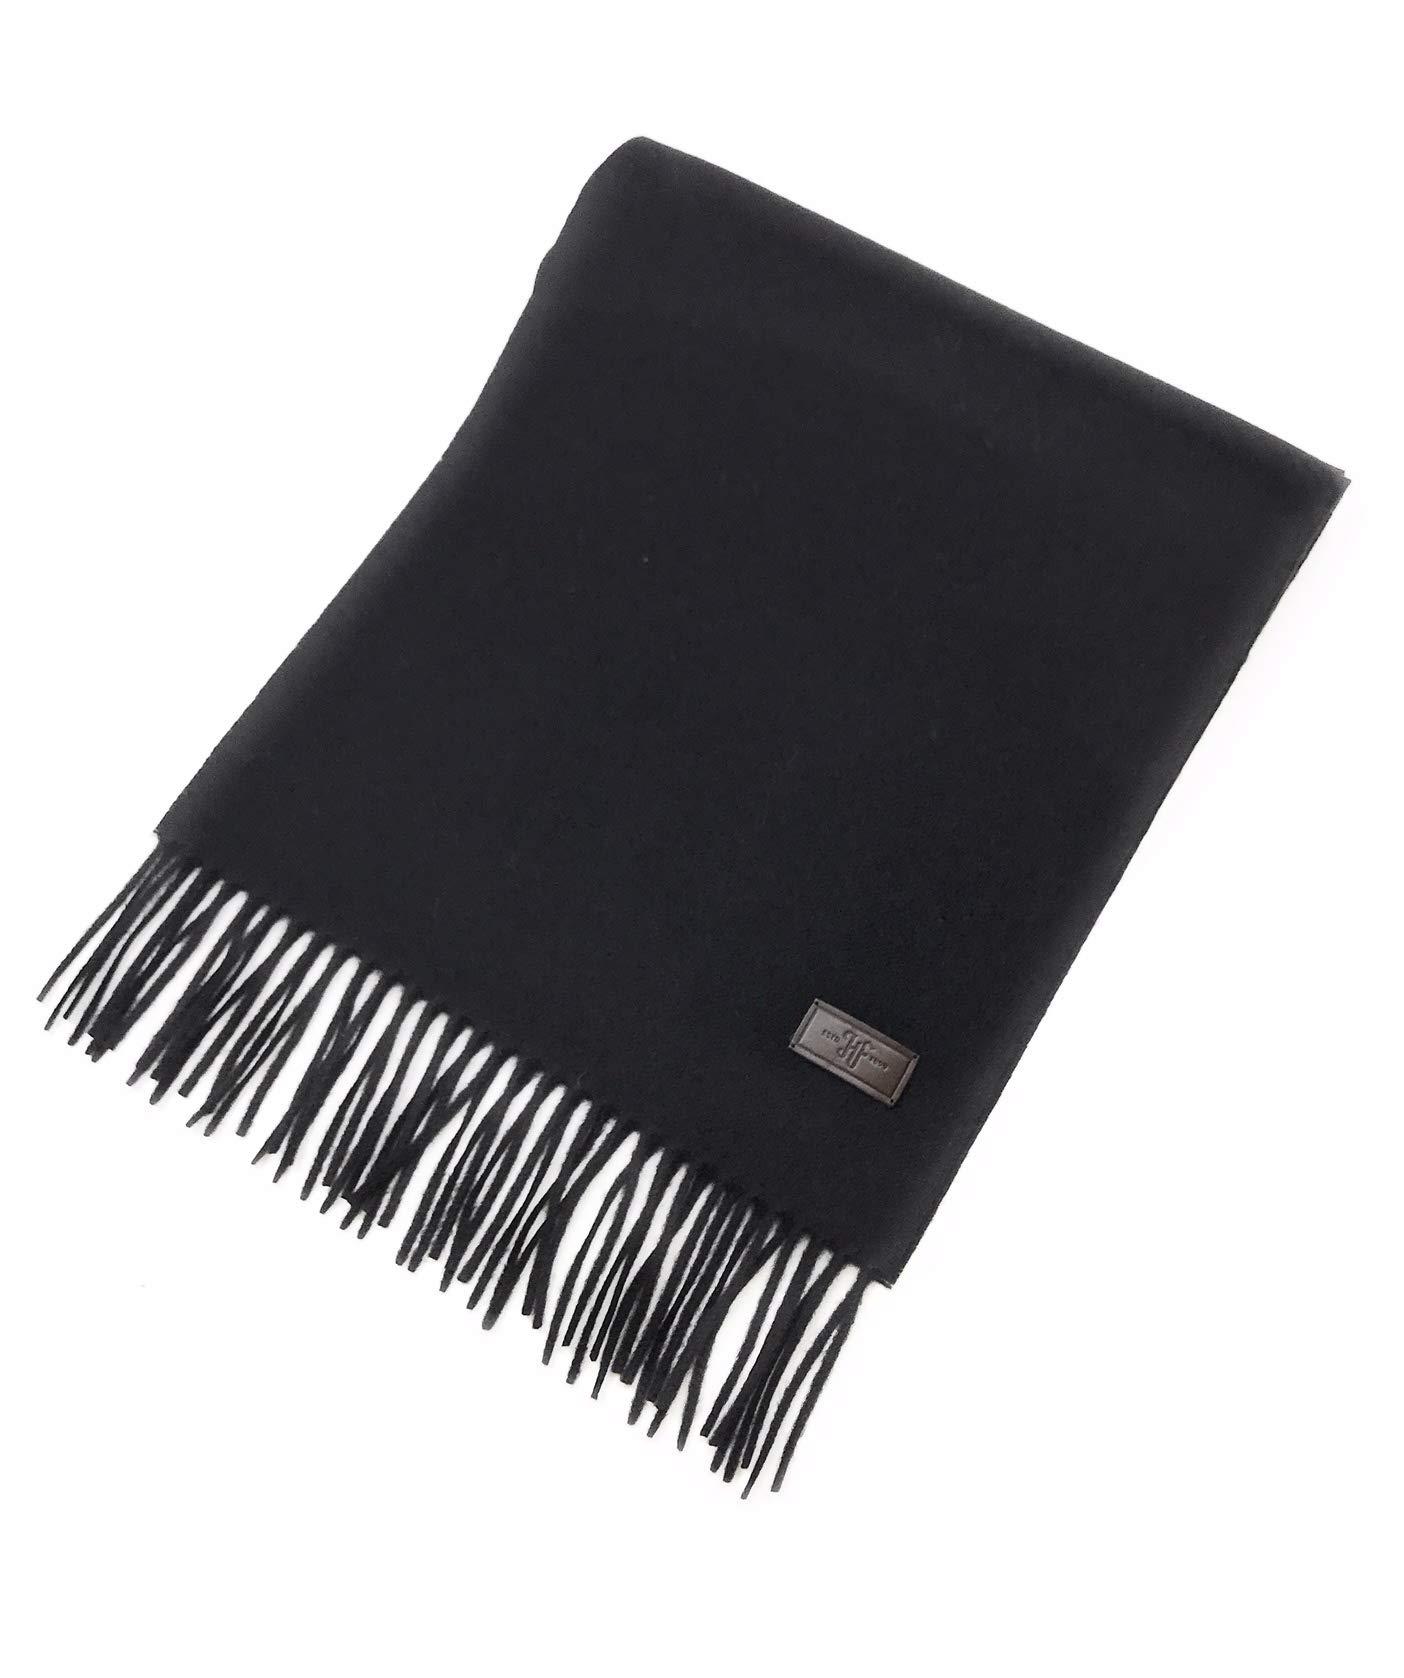 Men's Cashmere Scarf - Black, 100% Italian Cashmere, 72 inches x 12 inches, by Hickey Freeman by Hickey Freeman